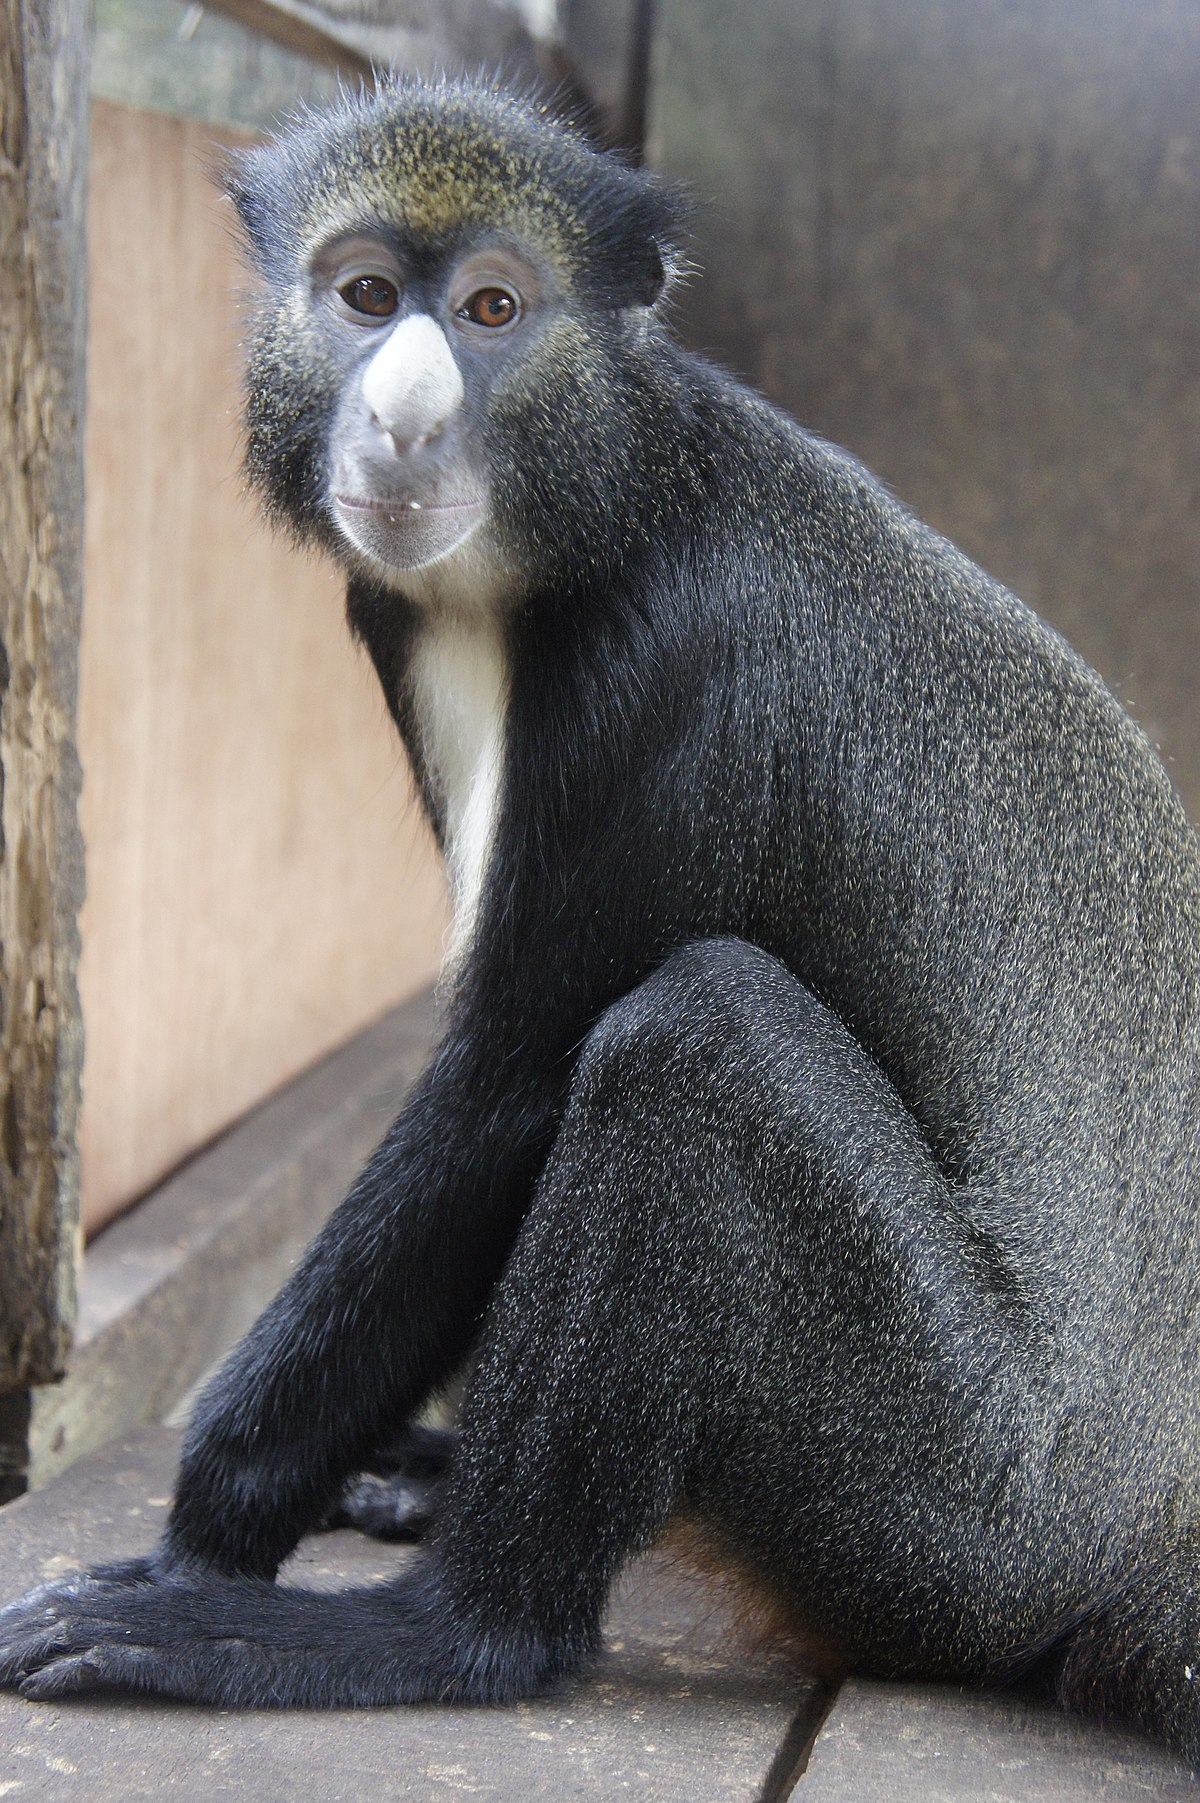 Fucking monkey spunk putty love getting